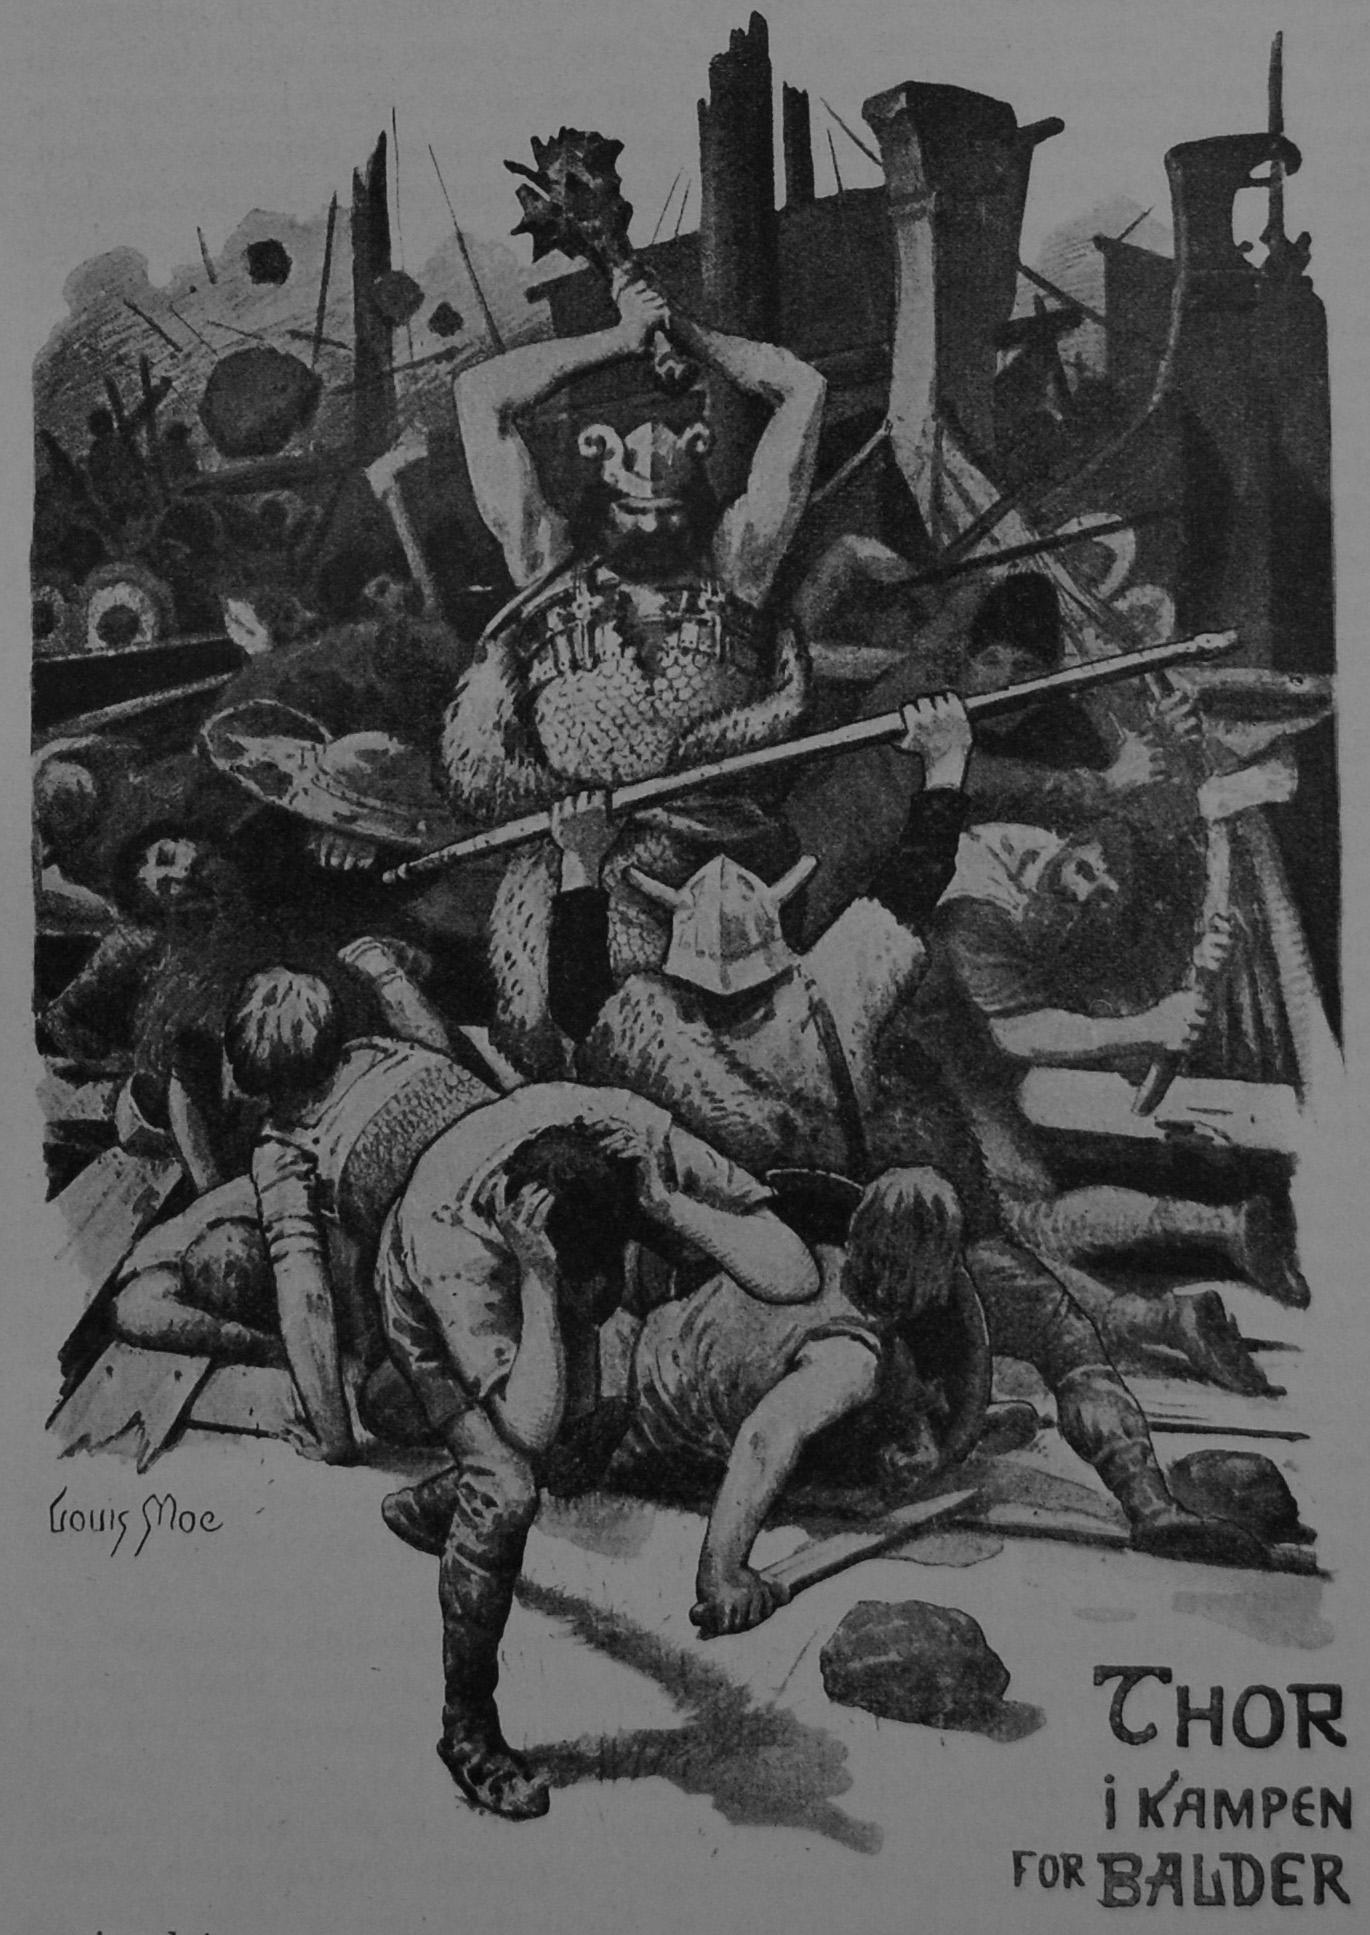 Þórr Fighting With a Club